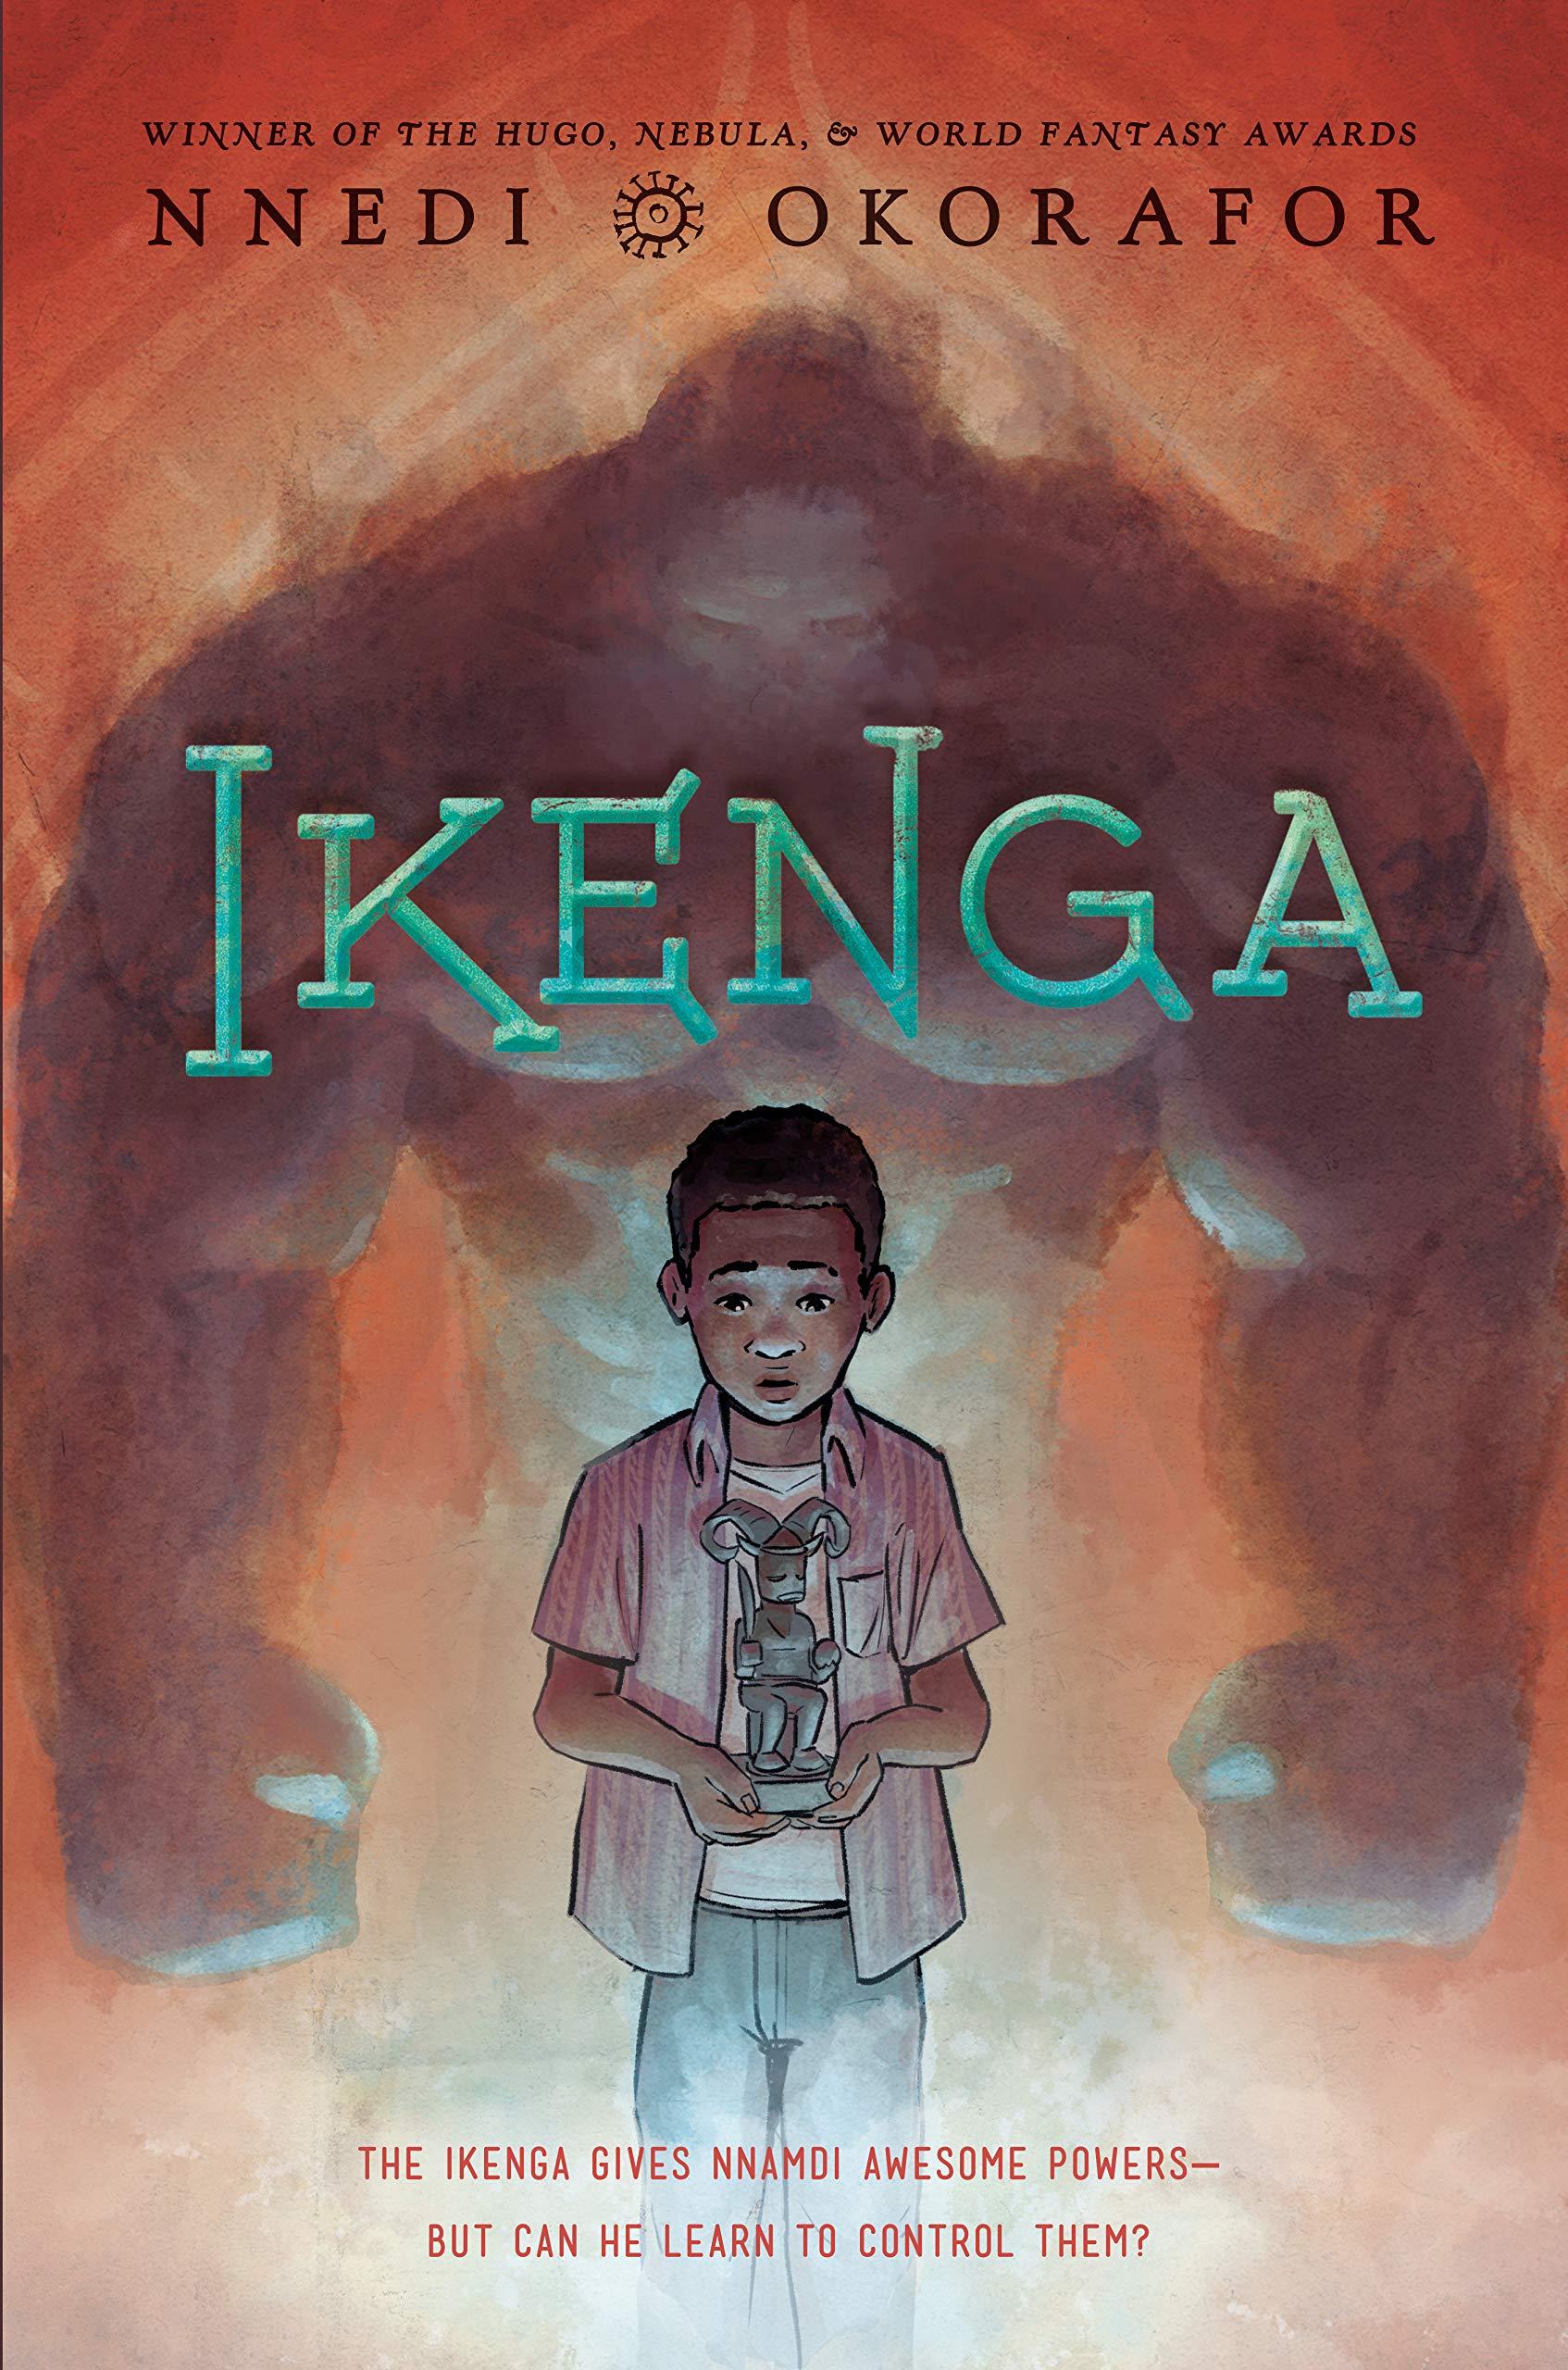 Amazon.com: Ikenga (9780593113523): Okorafor, Nnedi: Books